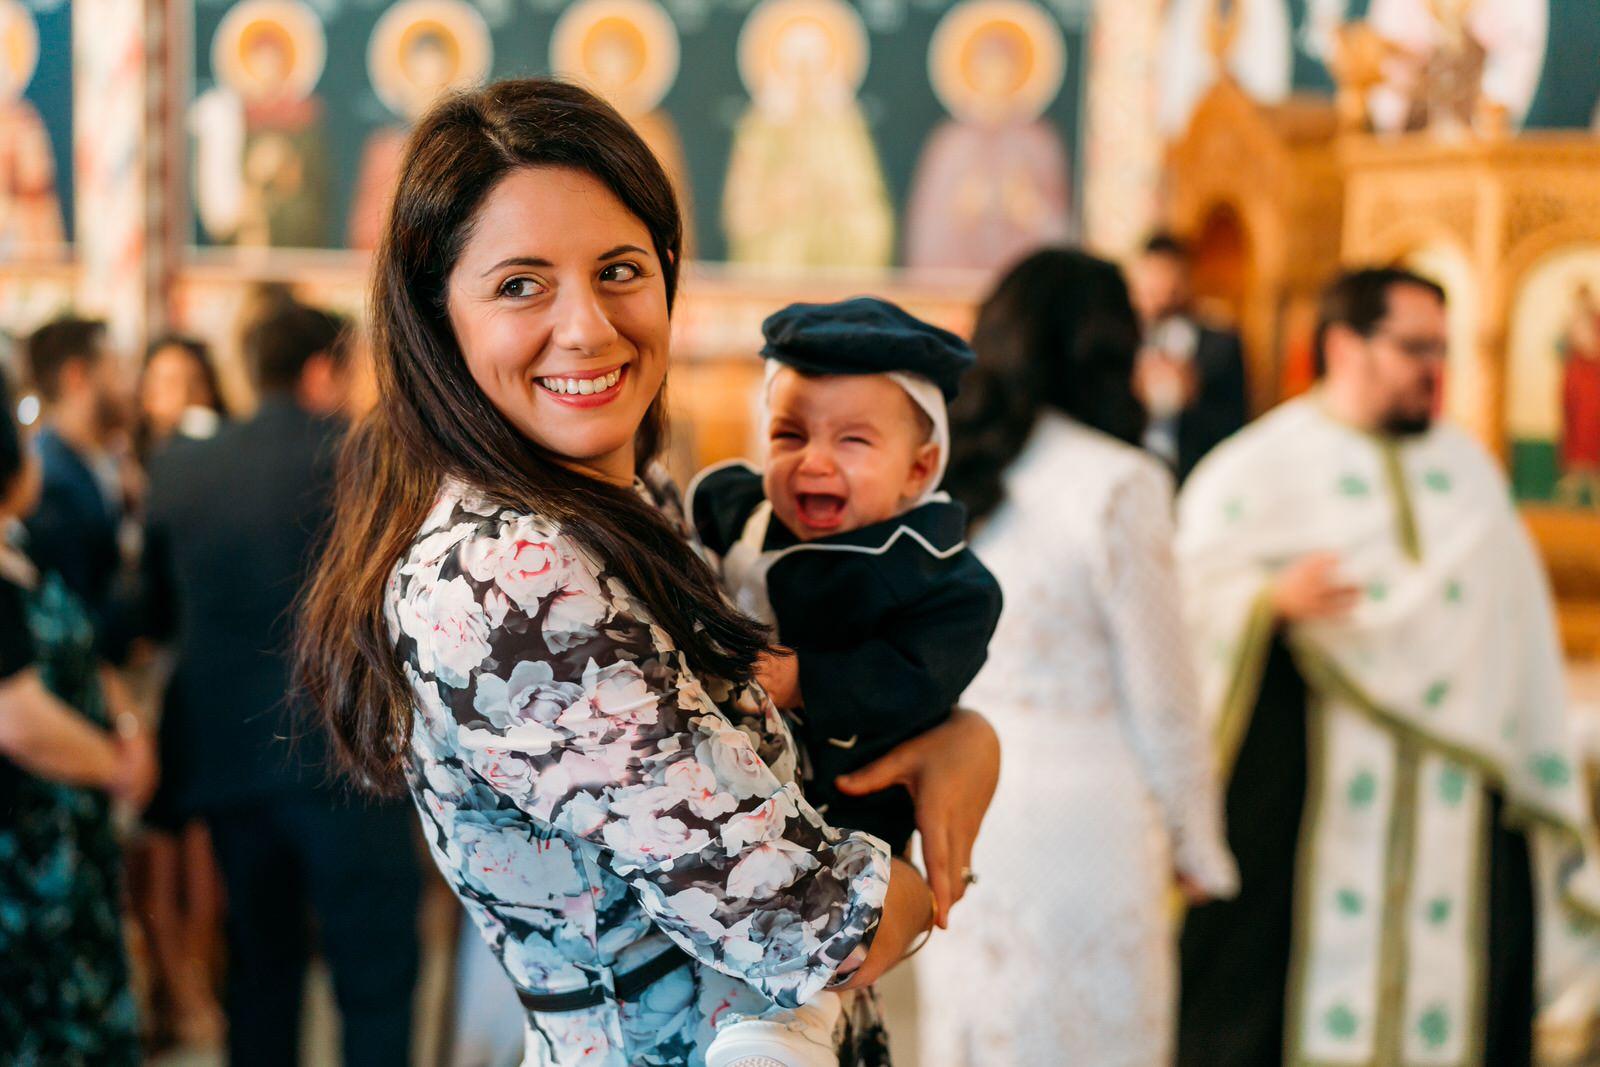 yianni-baptism-st-catherine-orthodox-mascot-laqua-144